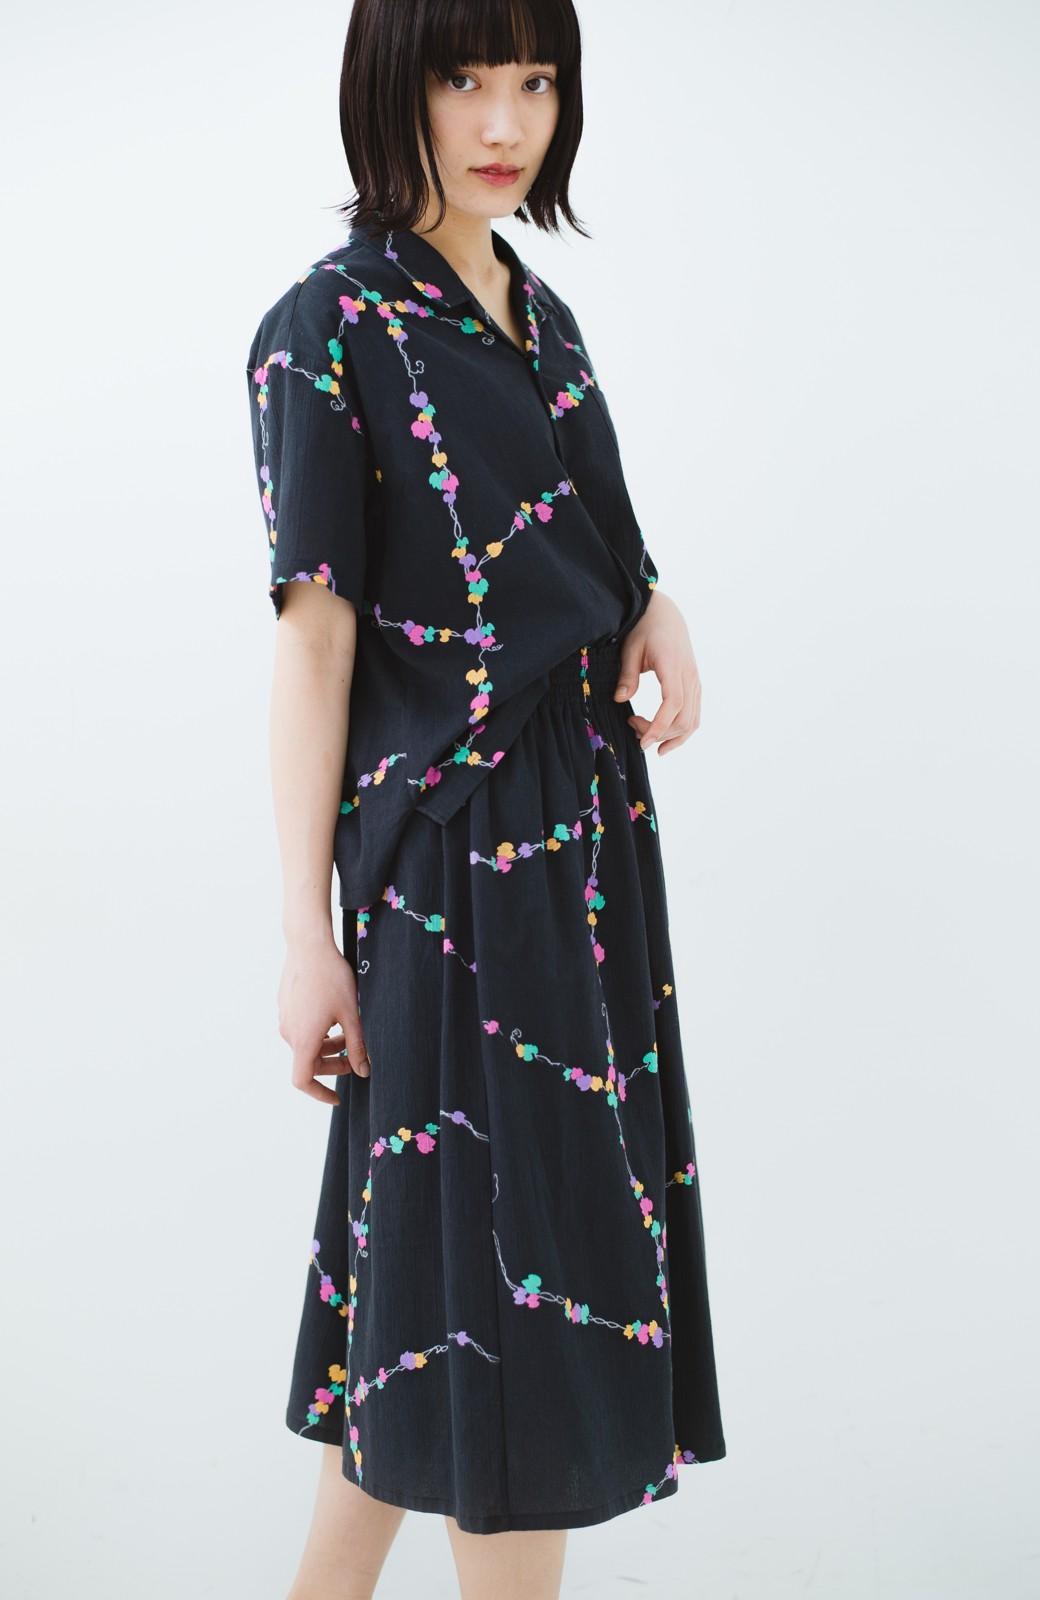 haco! 京都の浴衣屋さんと作った浴衣生地のスカート <ブラック系その他>の商品写真22